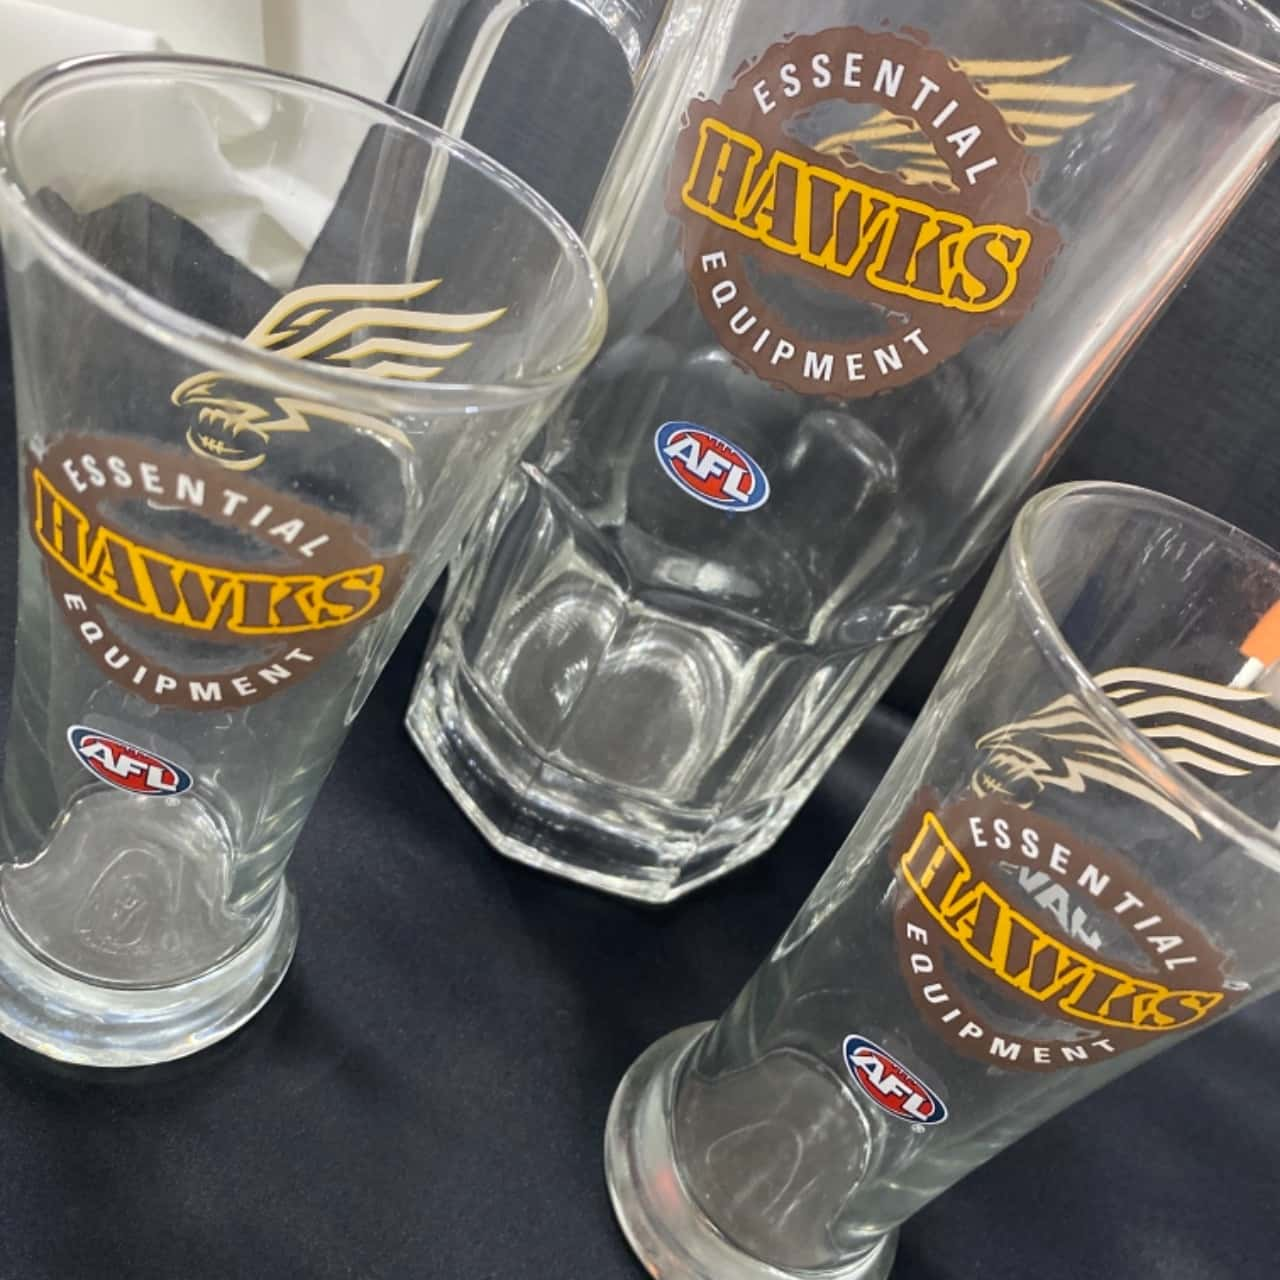 Hawthorn glasses